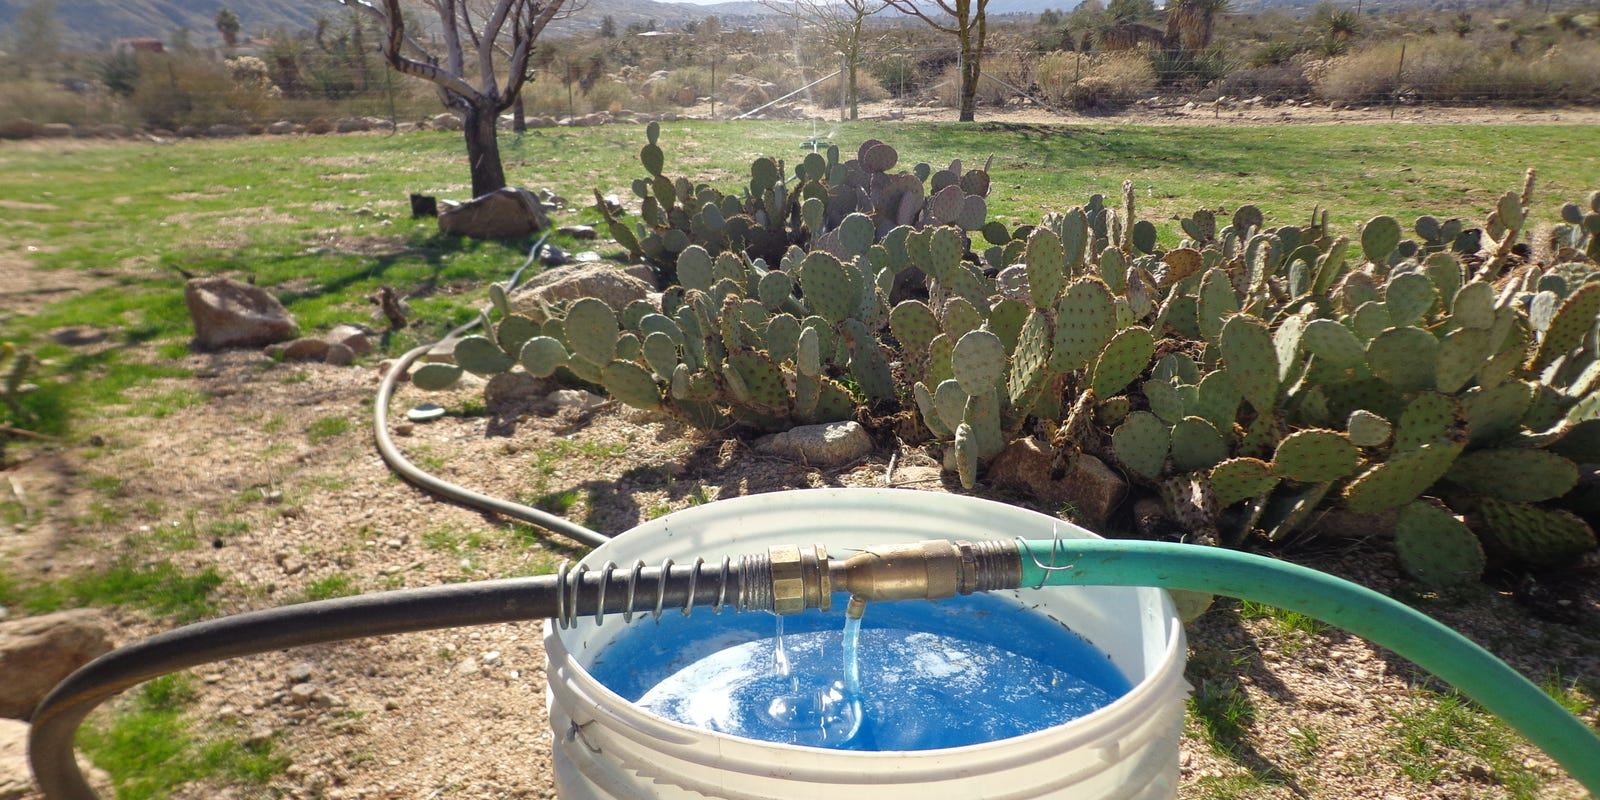 Improving your garden soil through a fertilizer injector